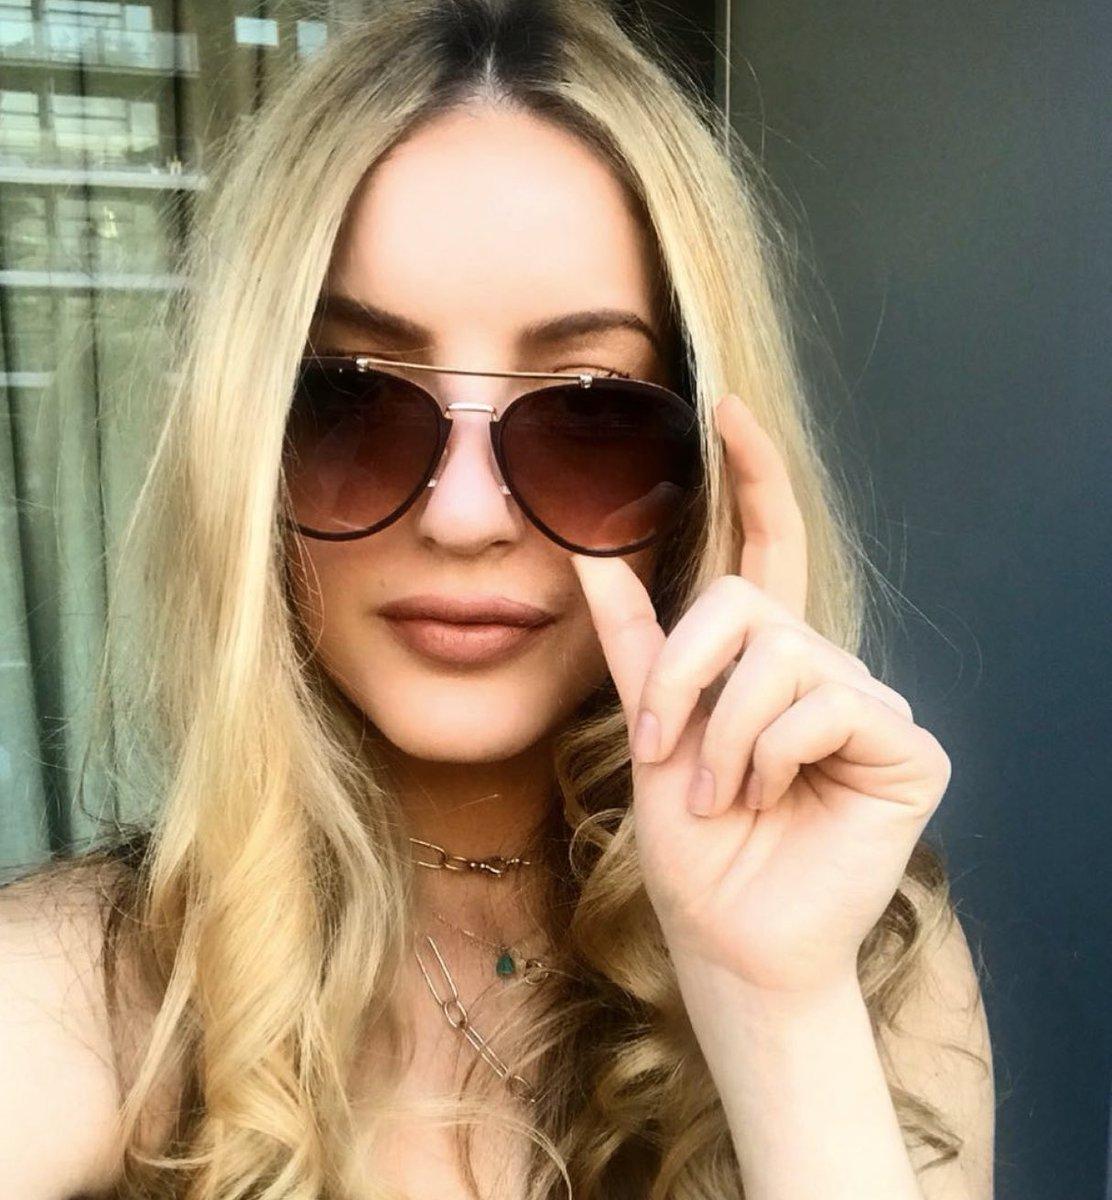 SUNDAY STYLE #velveteyewear #velvetsunglasses #velvettrends #velvetstylebox #bestsunglasses #2020color #socalstyle #designedbywomen #designedforwomen #bestcolor #coloroftheyear #uvprotection #lovevelvet #liketoknowit #findyourfaceshape #SunglassStyle #SunglassColor #dvclosetpic.twitter.com/TWRyIpJKuu